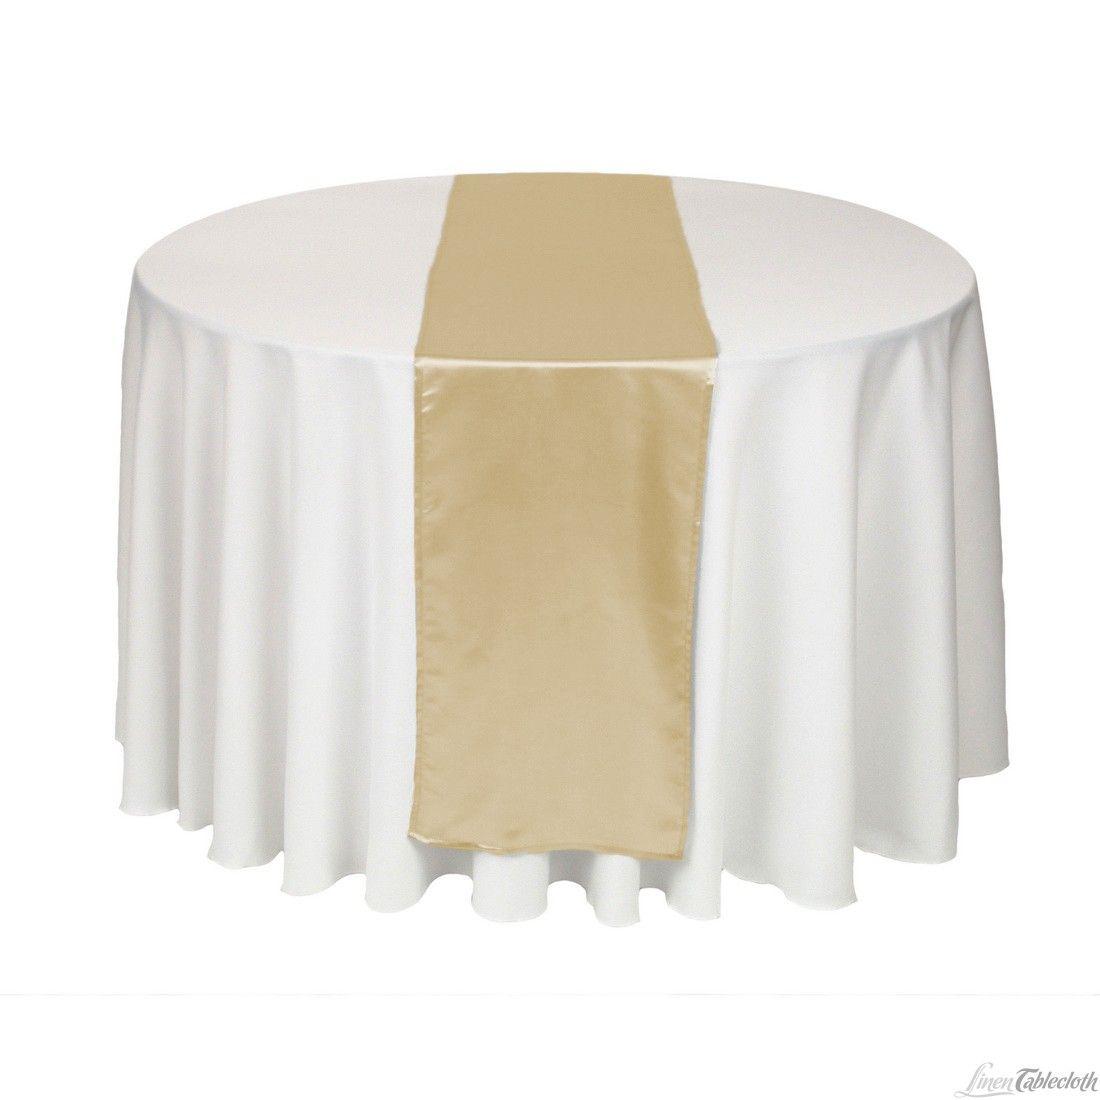 14 X 108 In Satin Table Runner Beige At Linentablecloth Com Manteles Para Bodas Decoracion De Unas Manteles